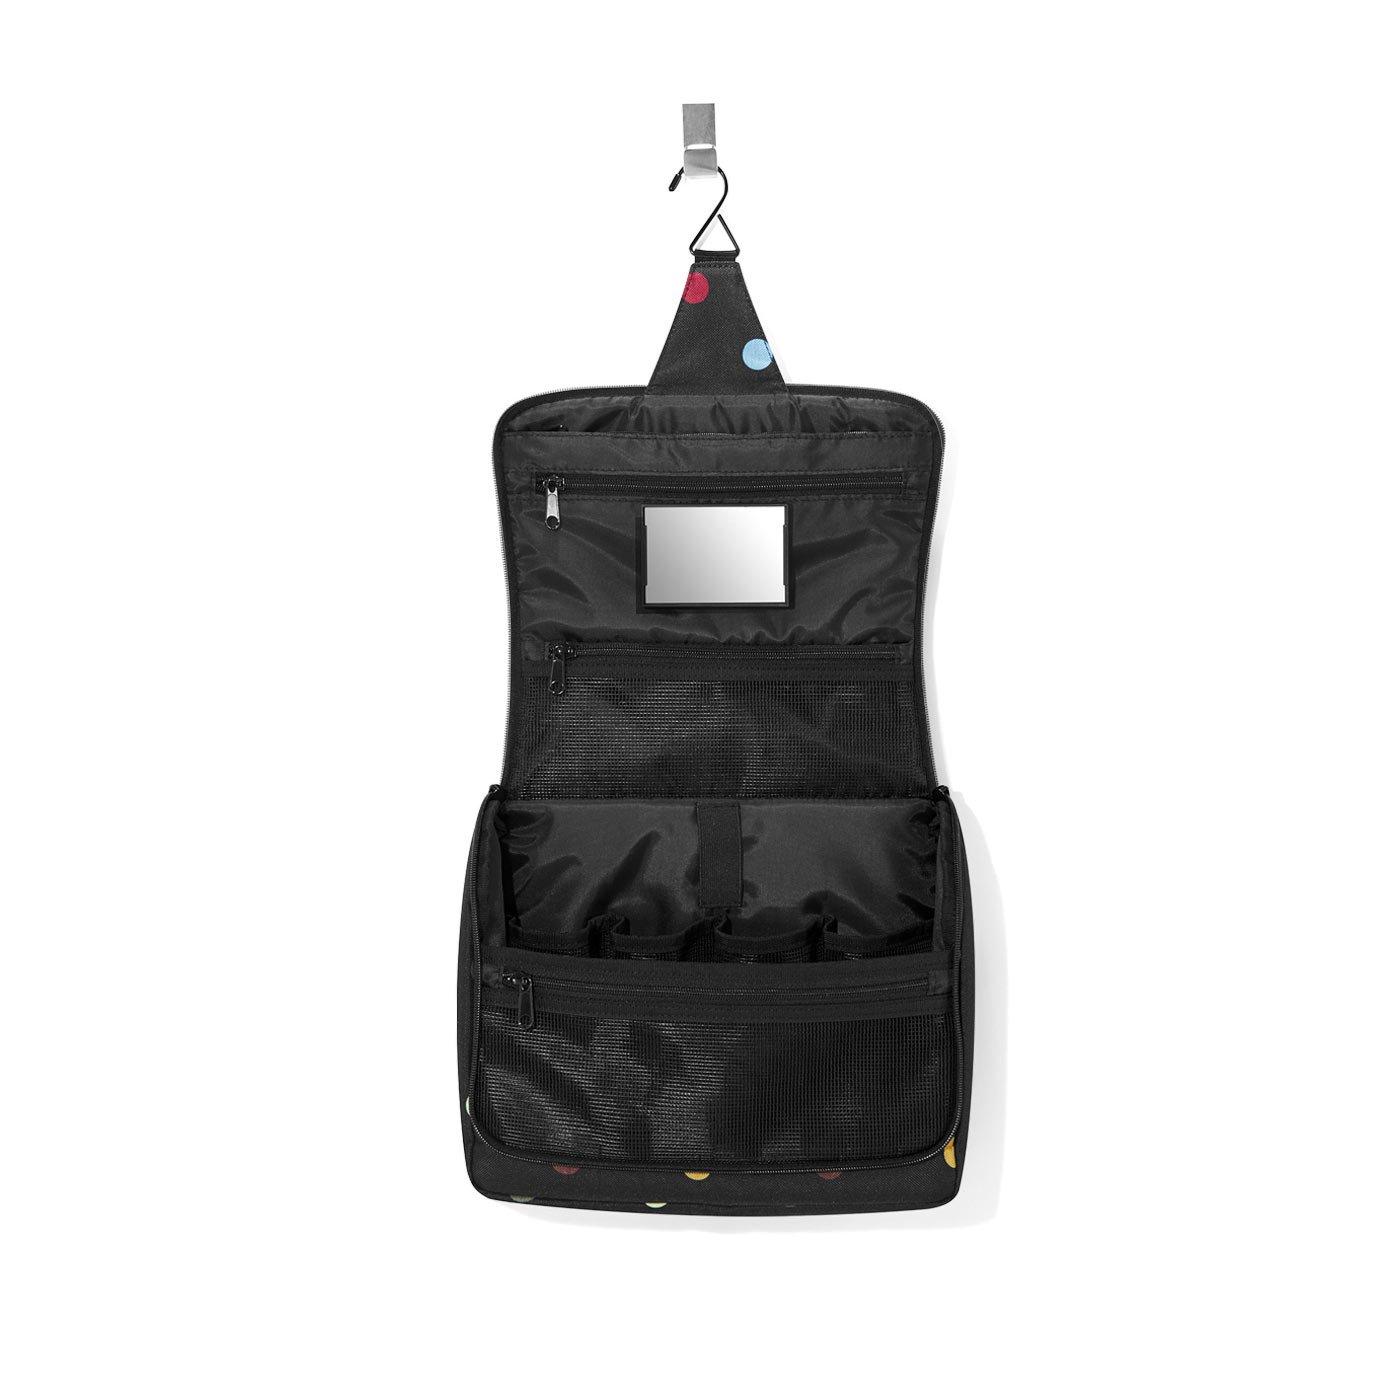 reisenthel Toiletbag XL, Hanging Travel Toiletry Organizer, Dots by reisenthel (Image #3)